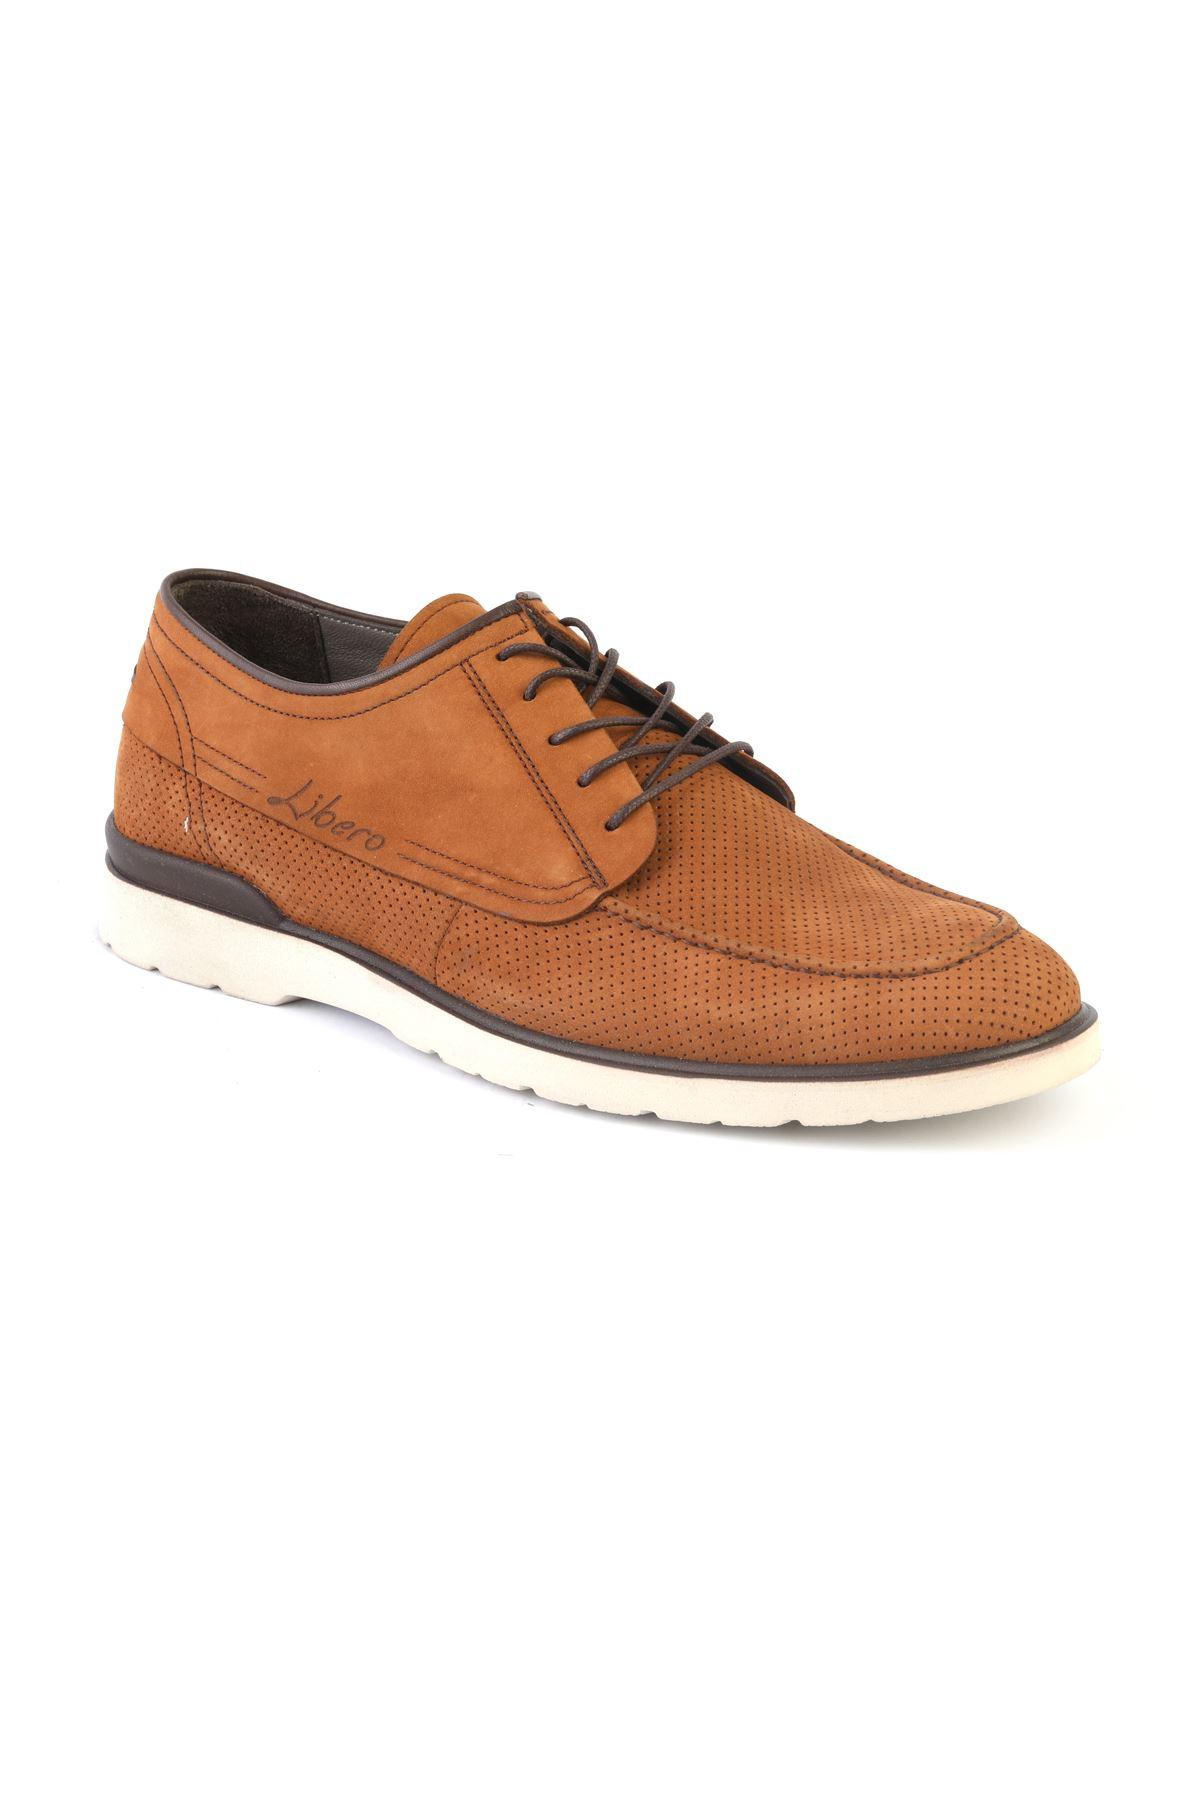 Libero T1197 Tan Casual Shoes